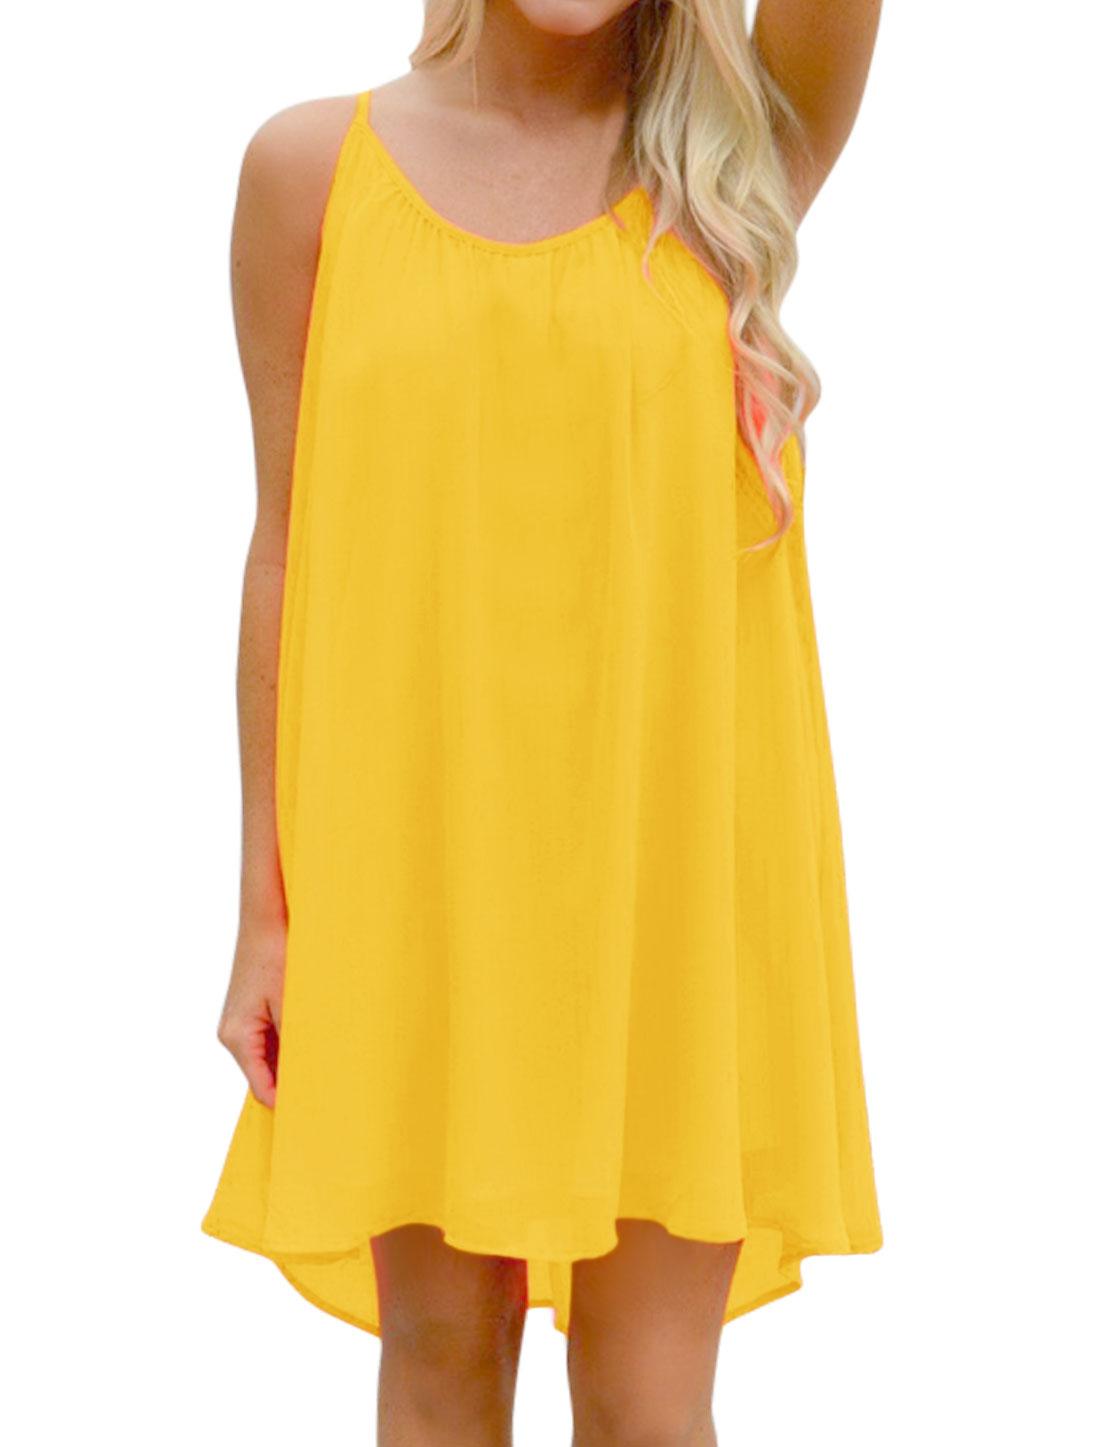 Women Spaghetti Straps Hollow Out Panel Back Loose Chiffon Dress Yellow M